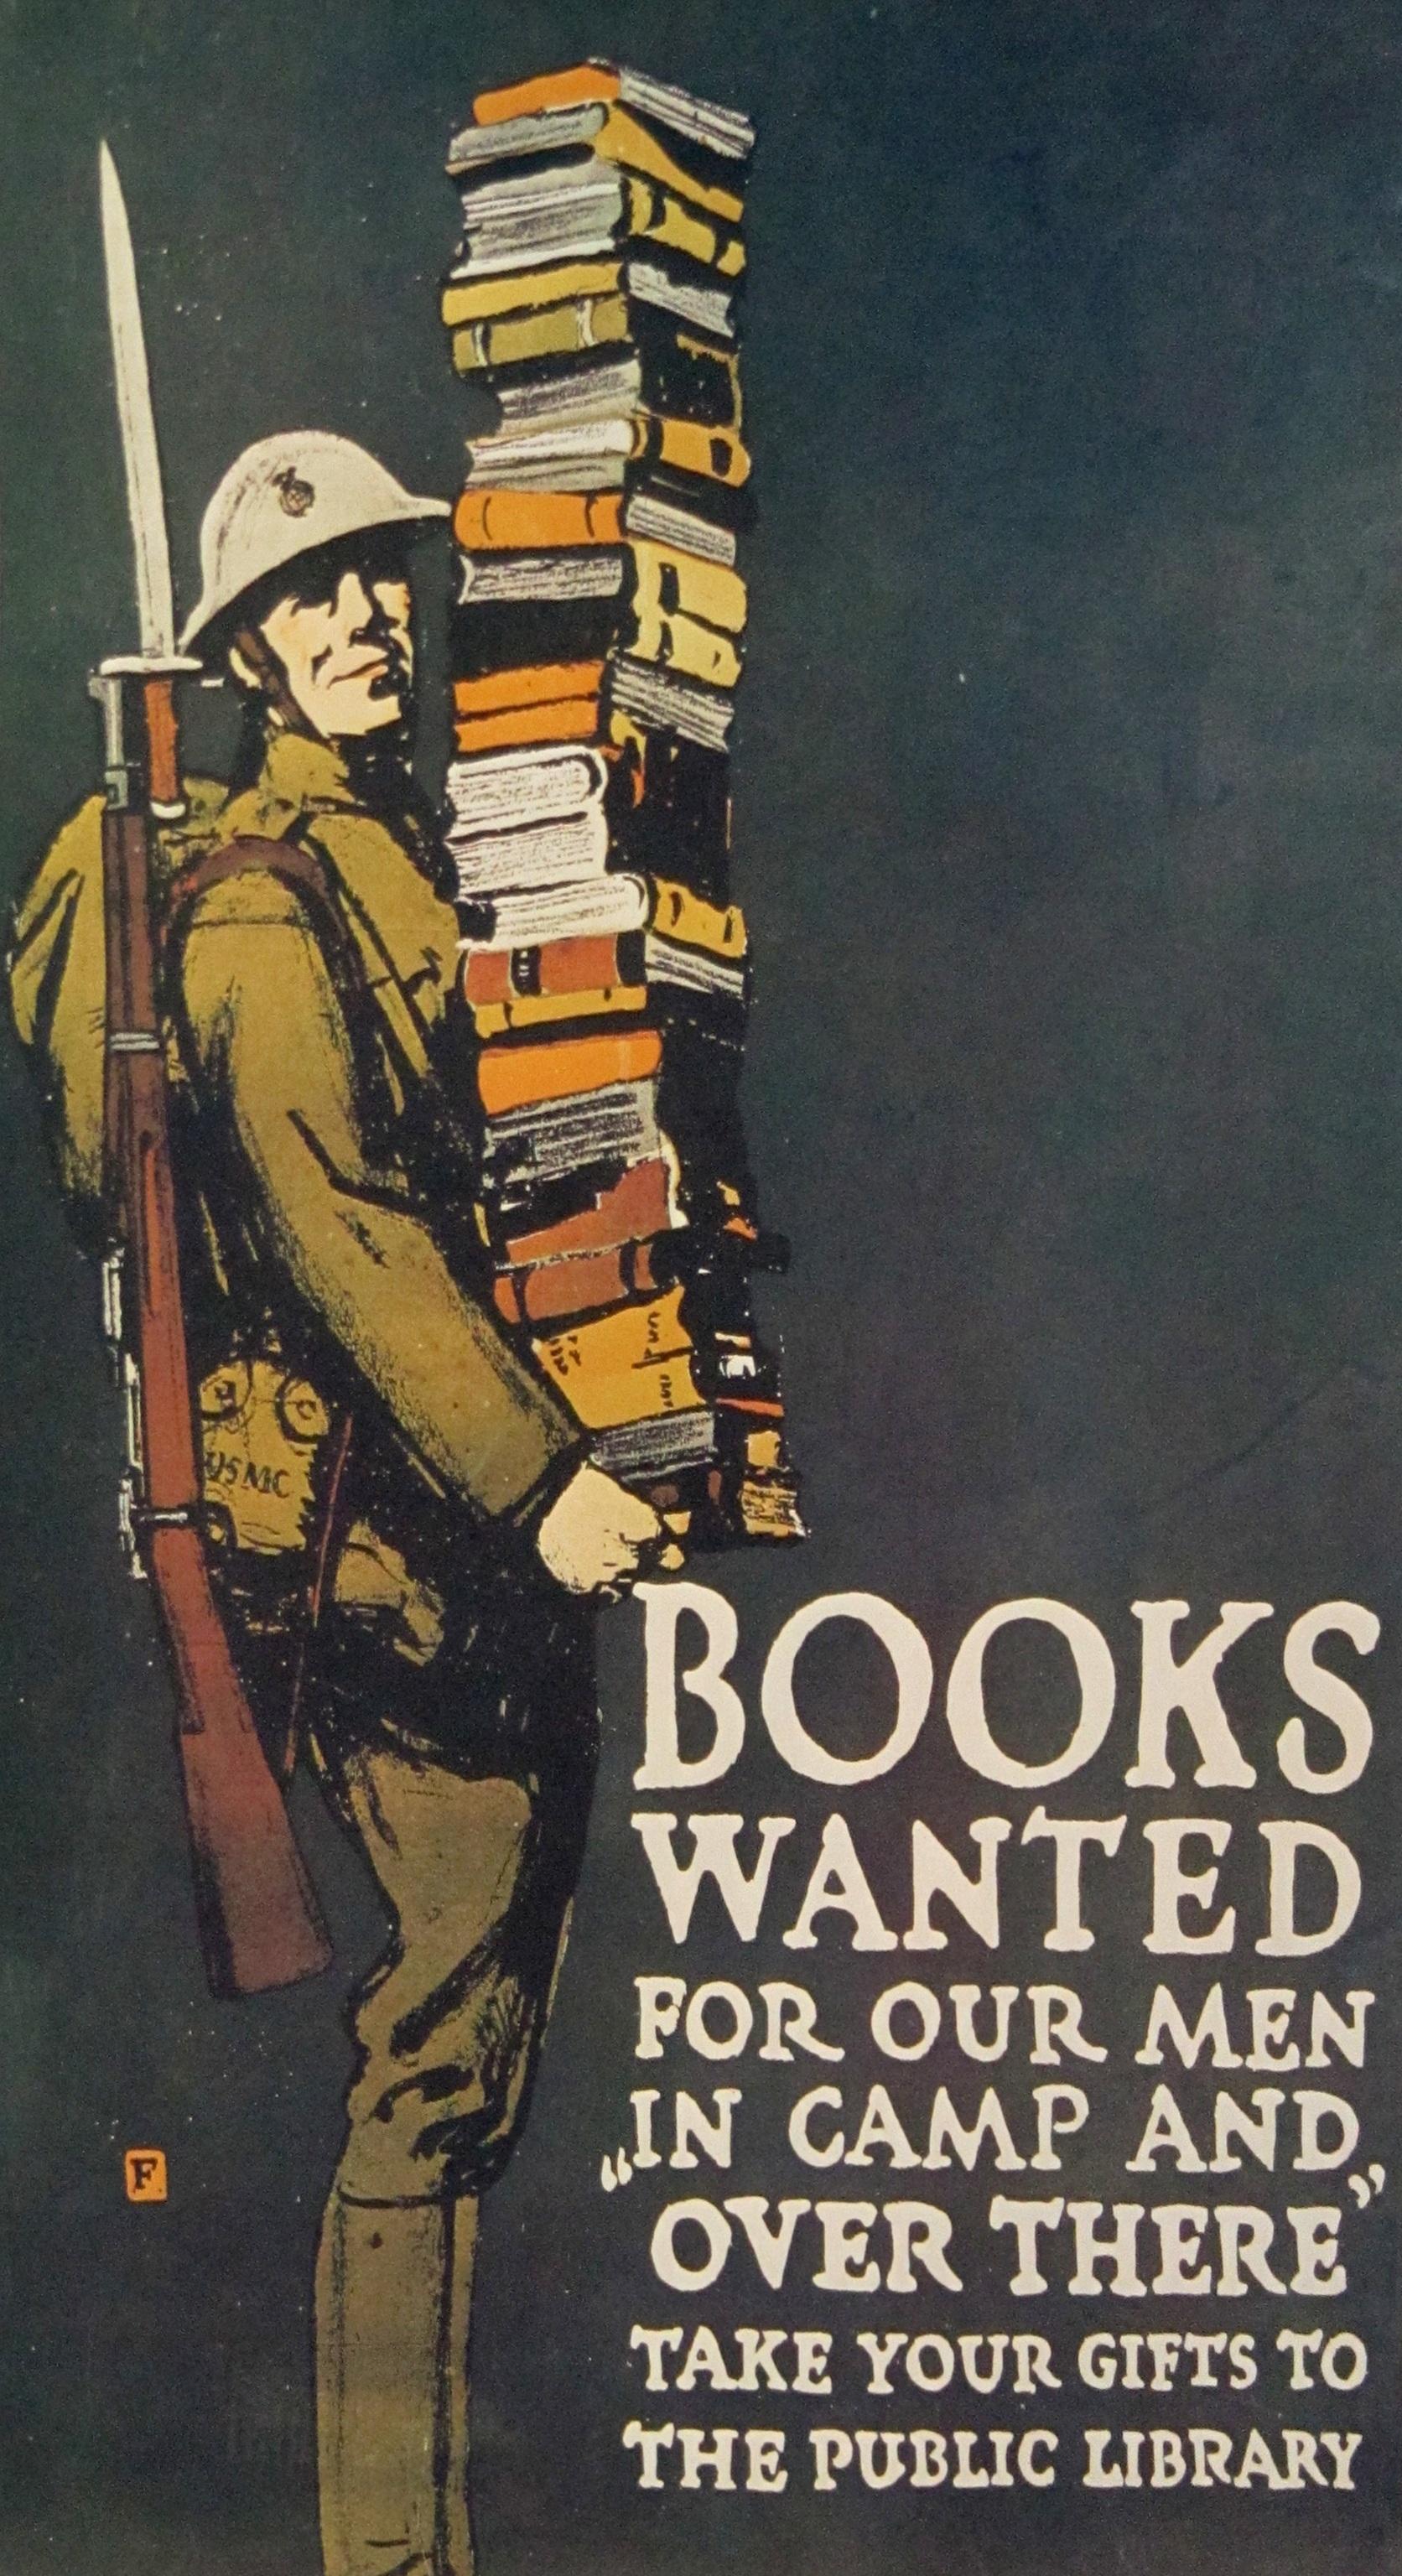 Gambar Manusia Book Vintage Antik Retro Tua Militer Tentara